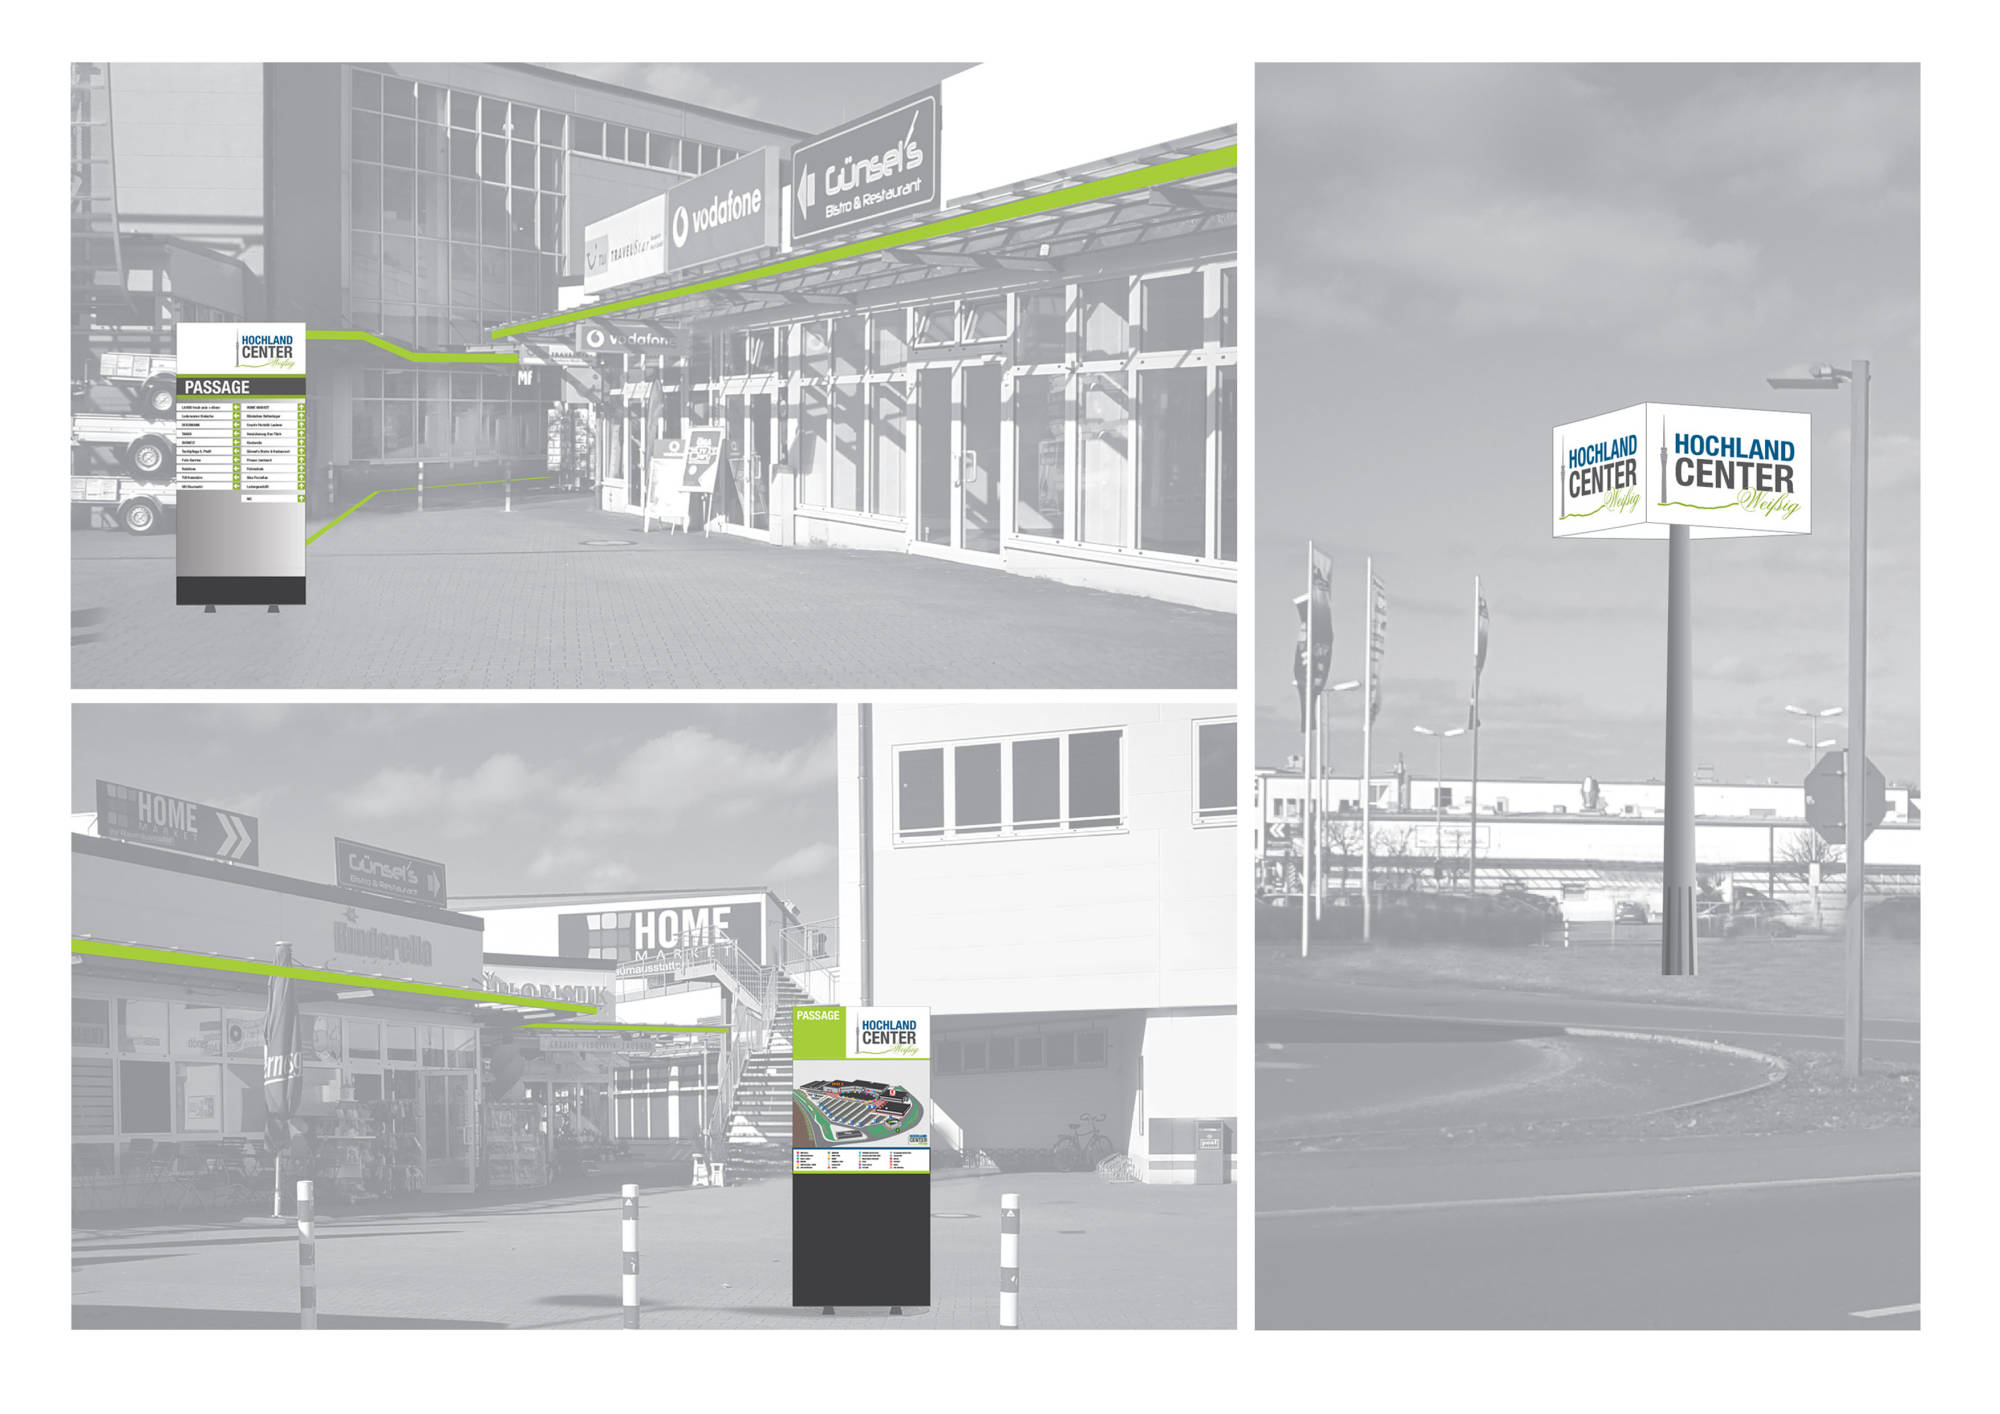 Hochland Center Leitsystem